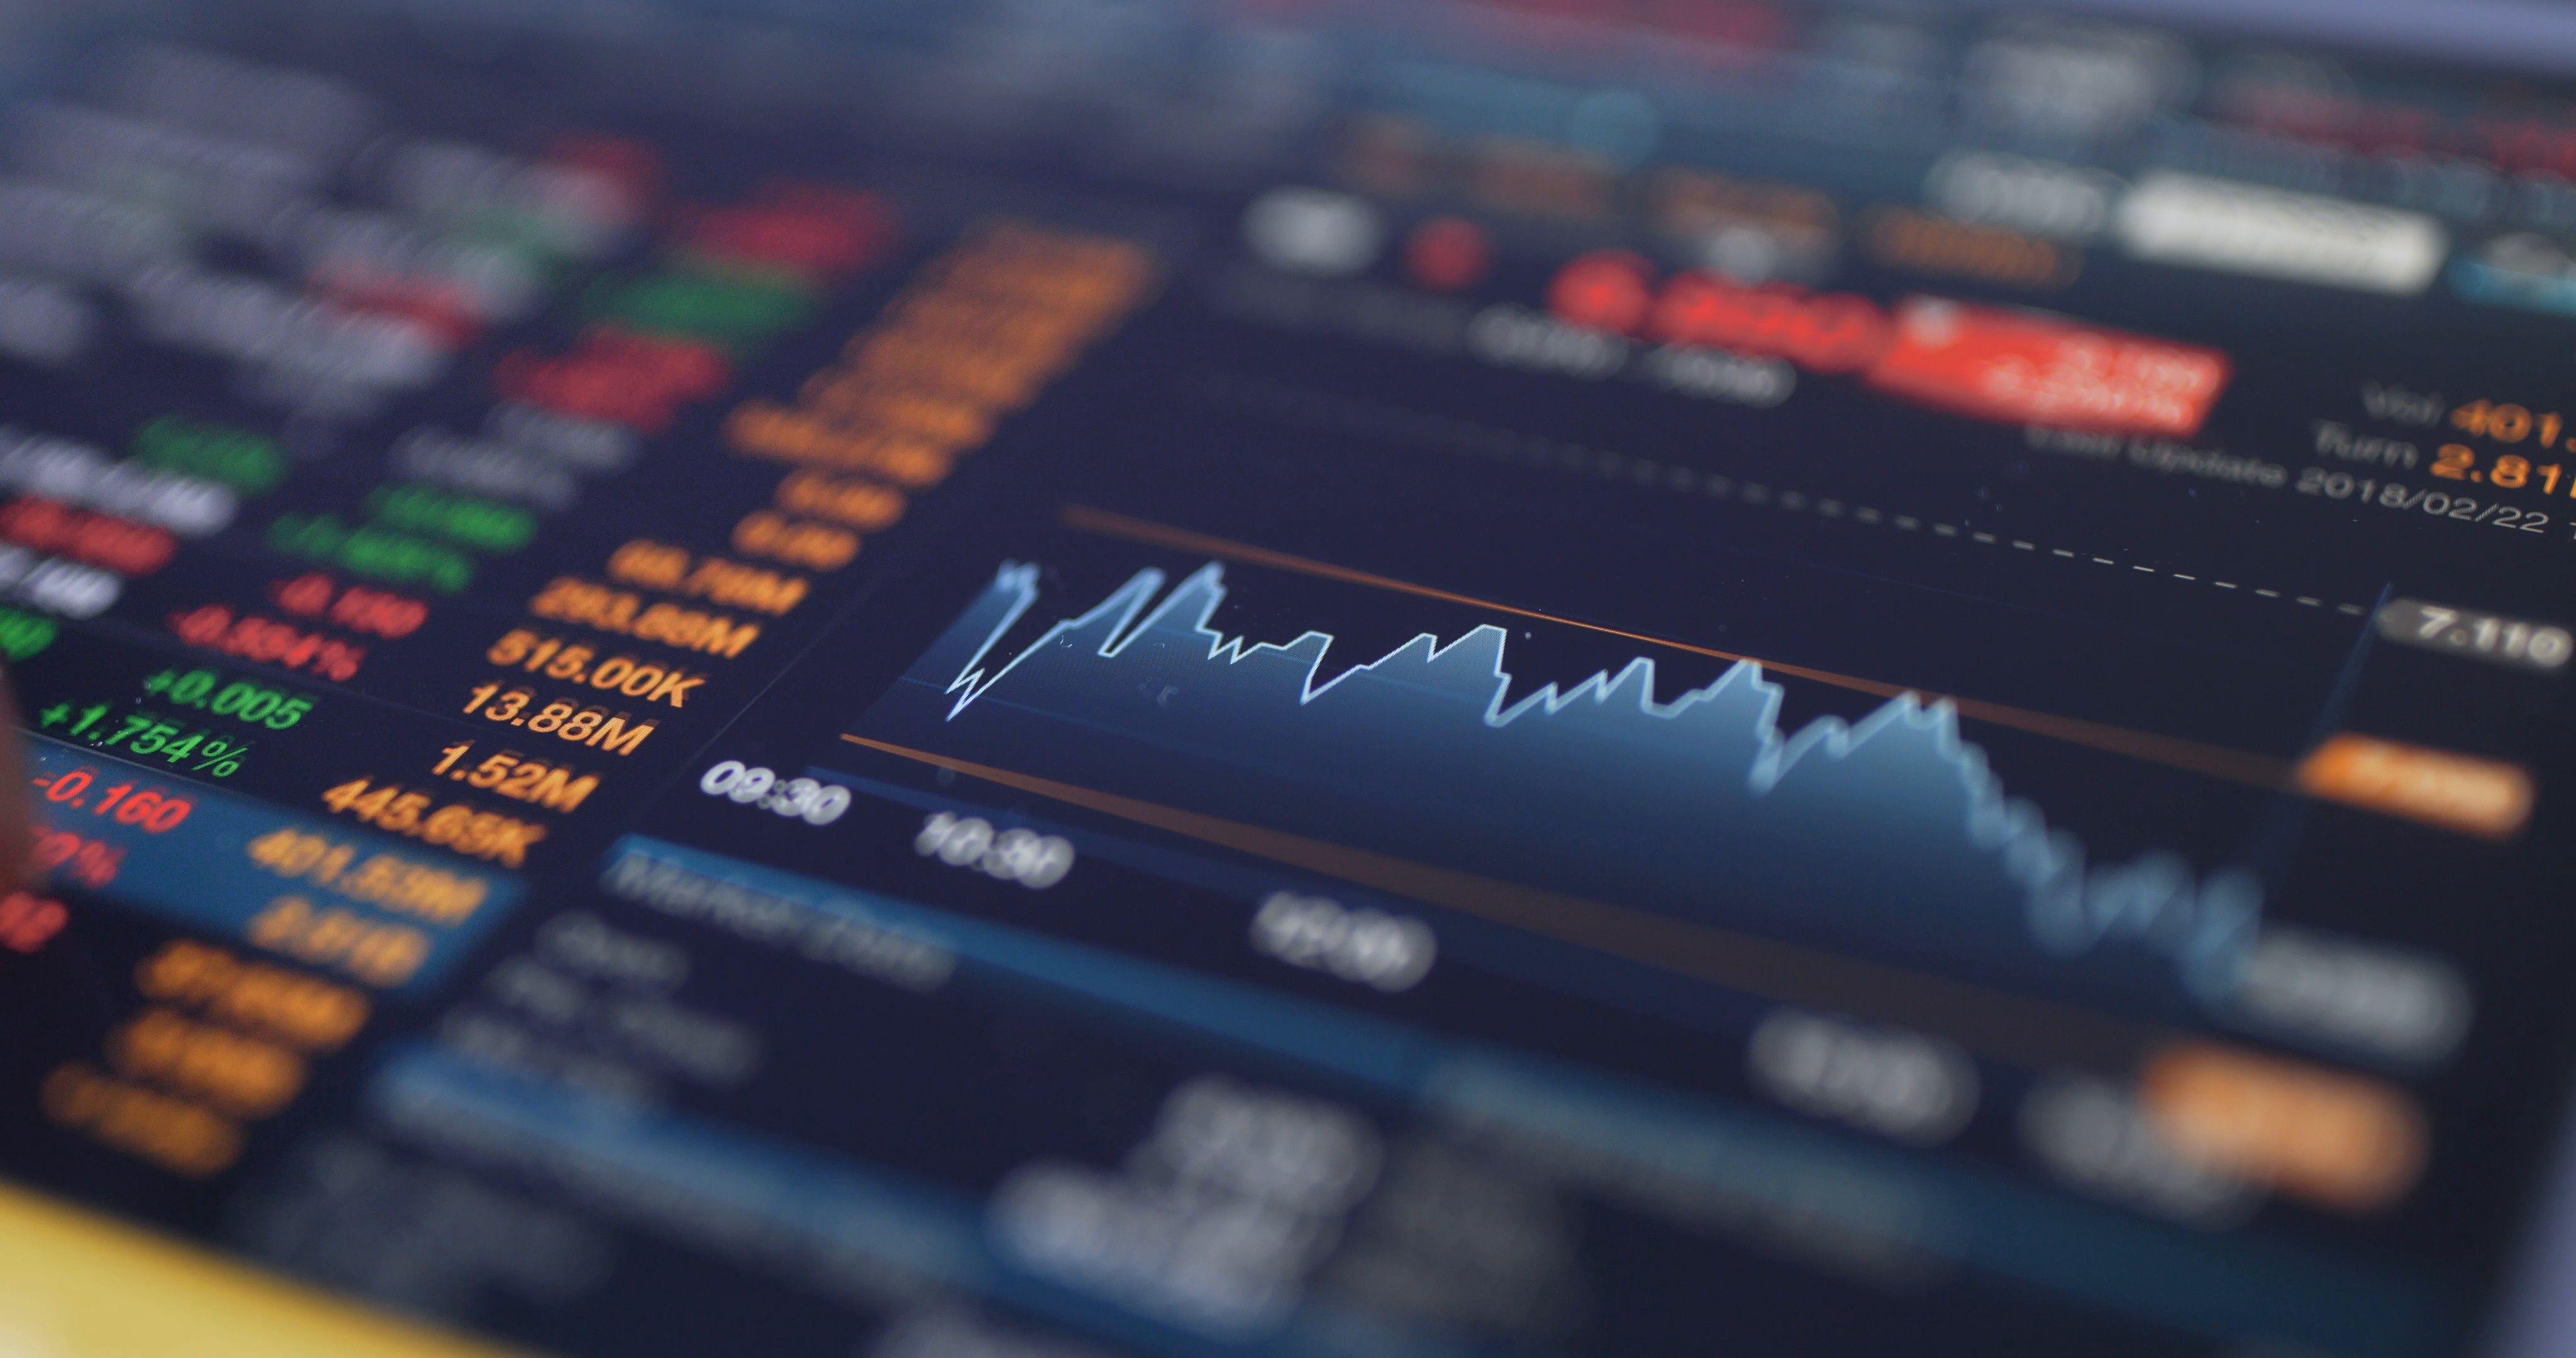 Digital Tablet Display The Stock Market Data Stock Footage Ad Display Stock Digital Tablet Stock Market Data Digital Tablet Marketing Data